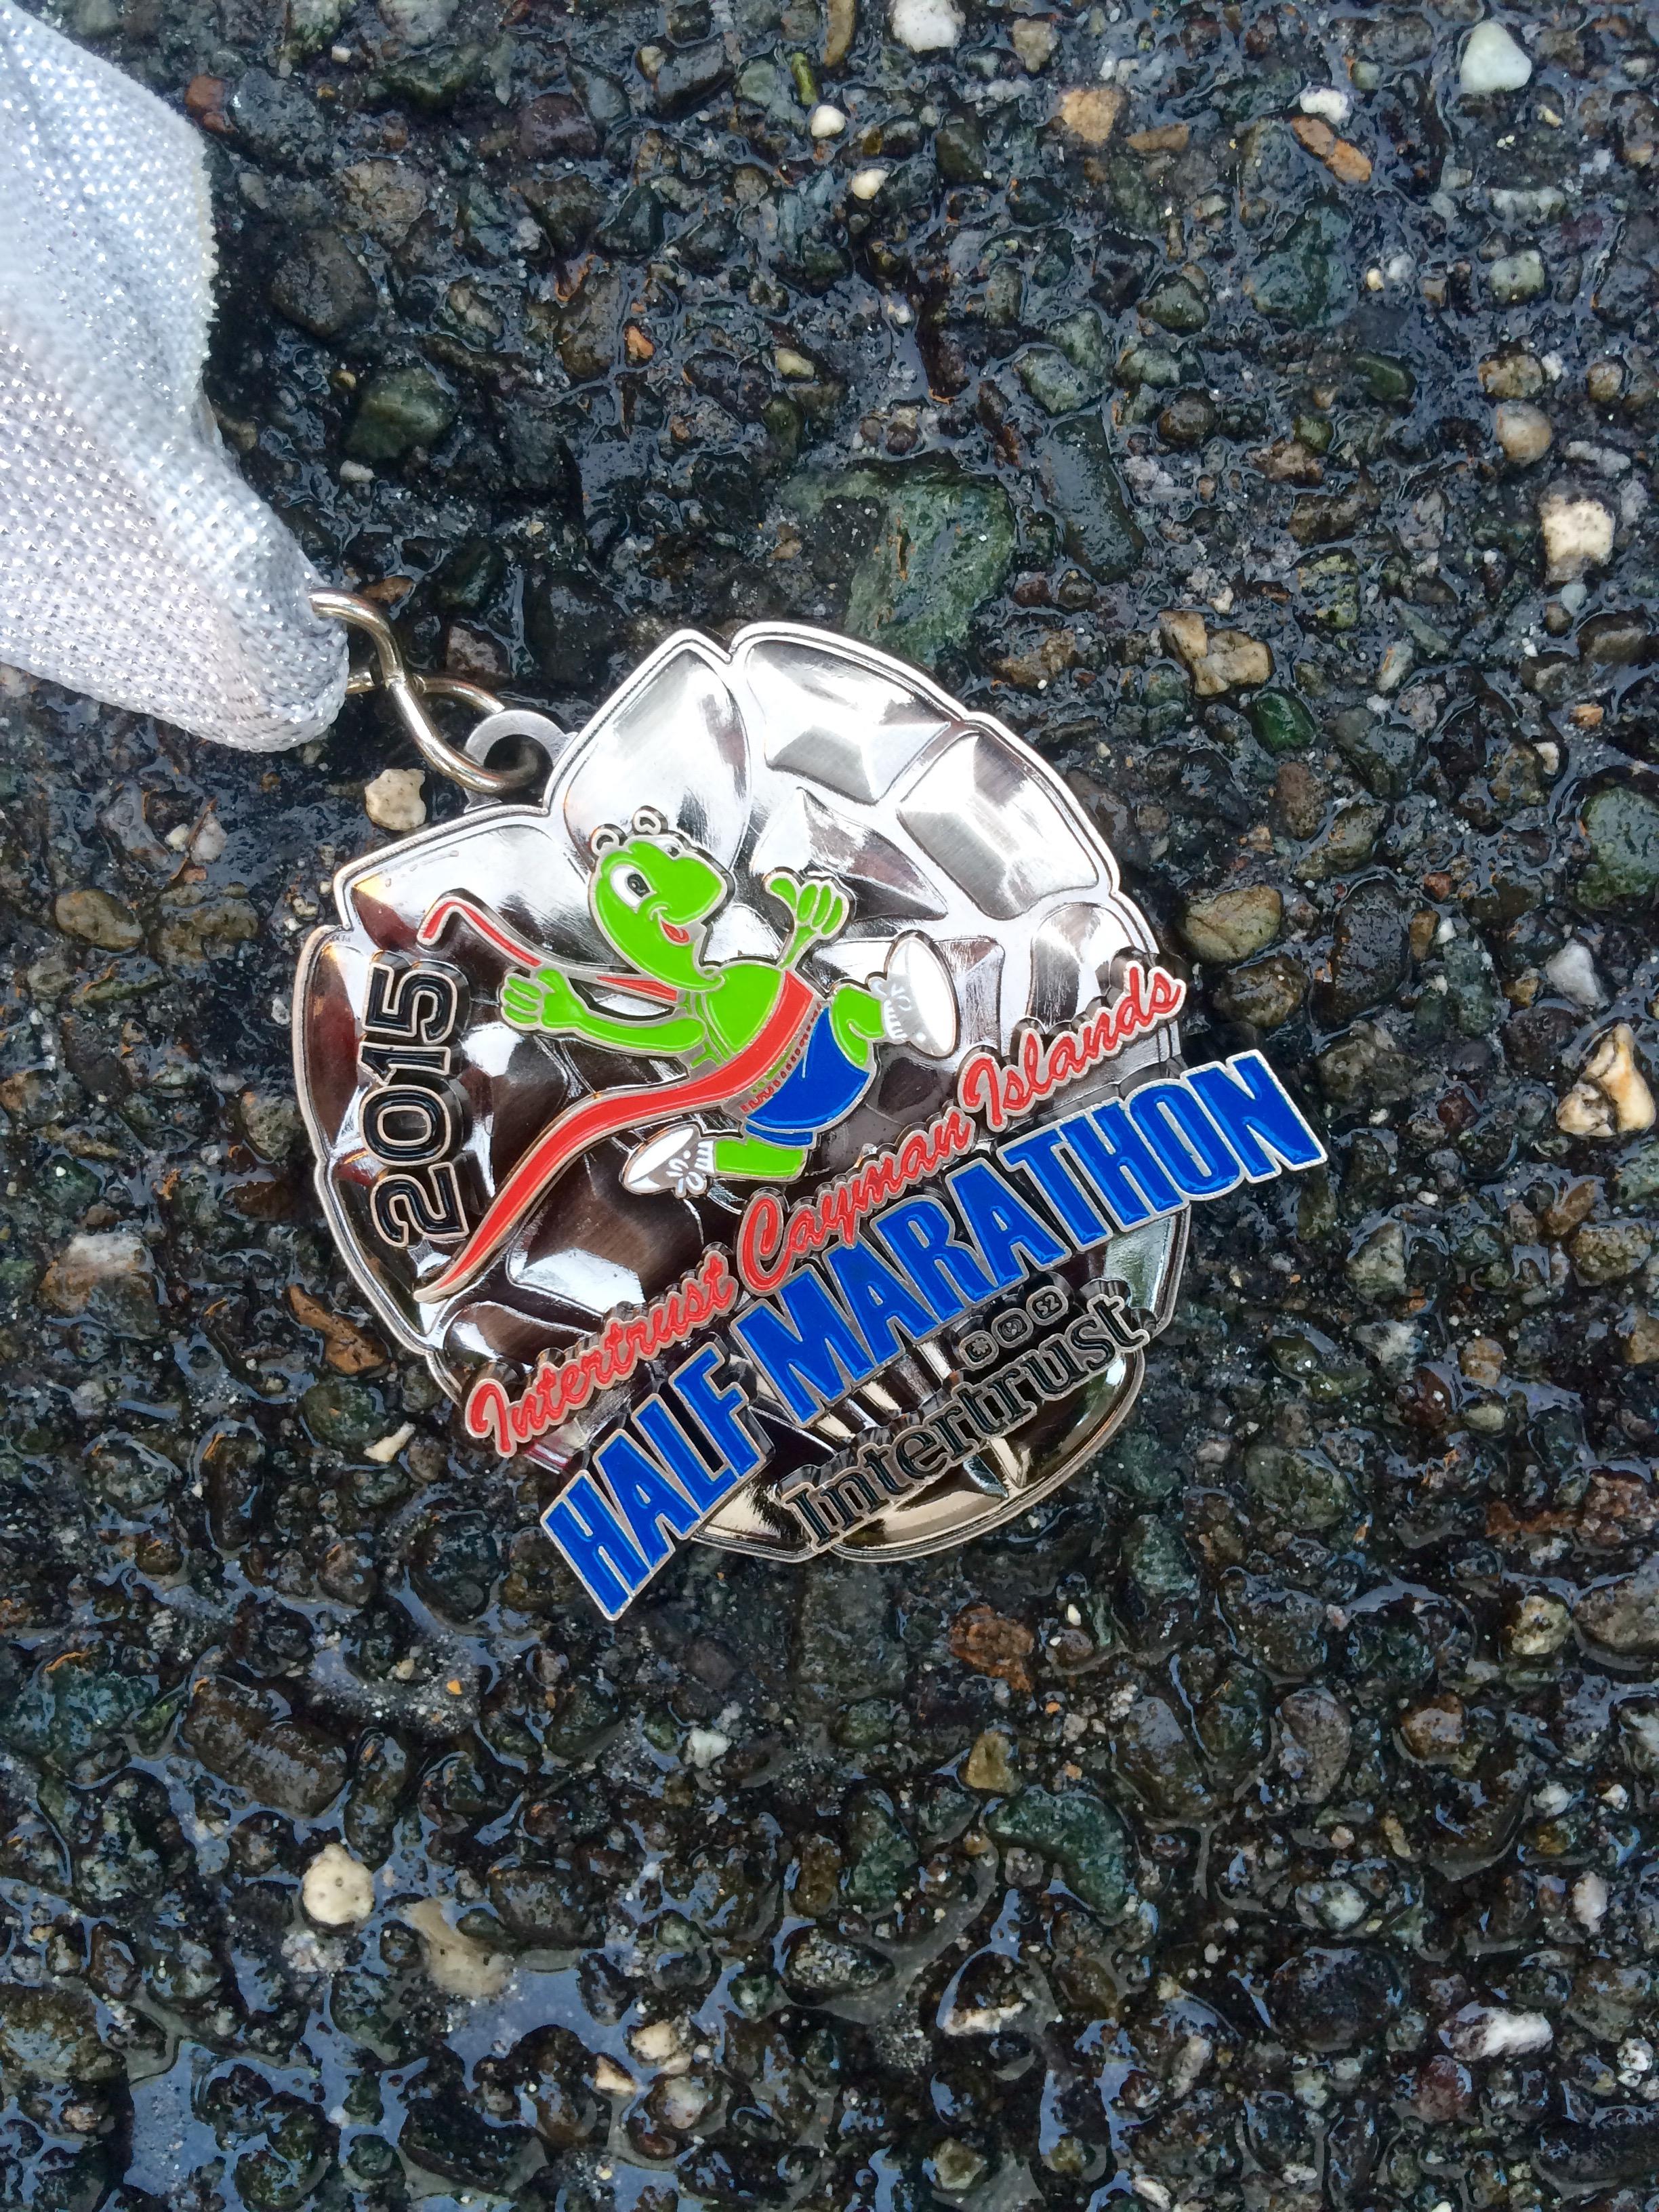 Cayman Islands Half Marathon